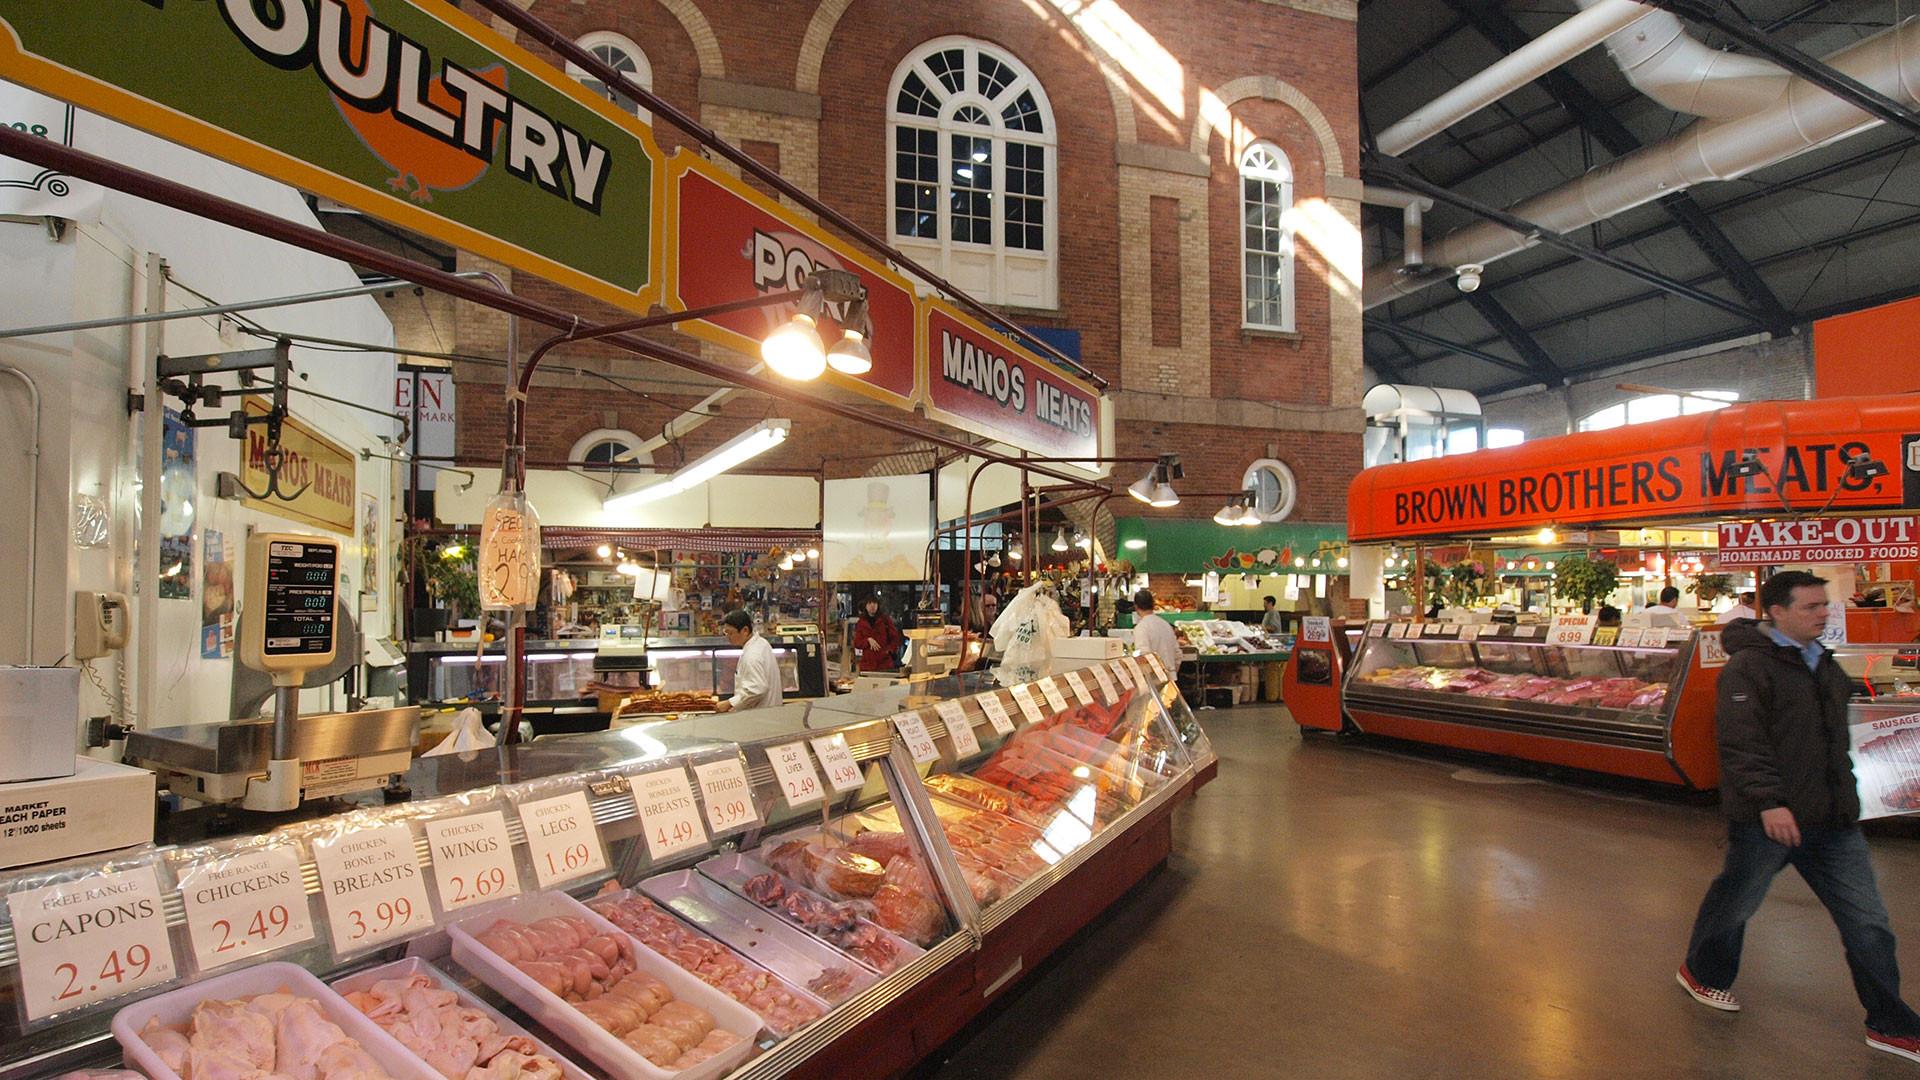 Toronto's St Lawrence Market